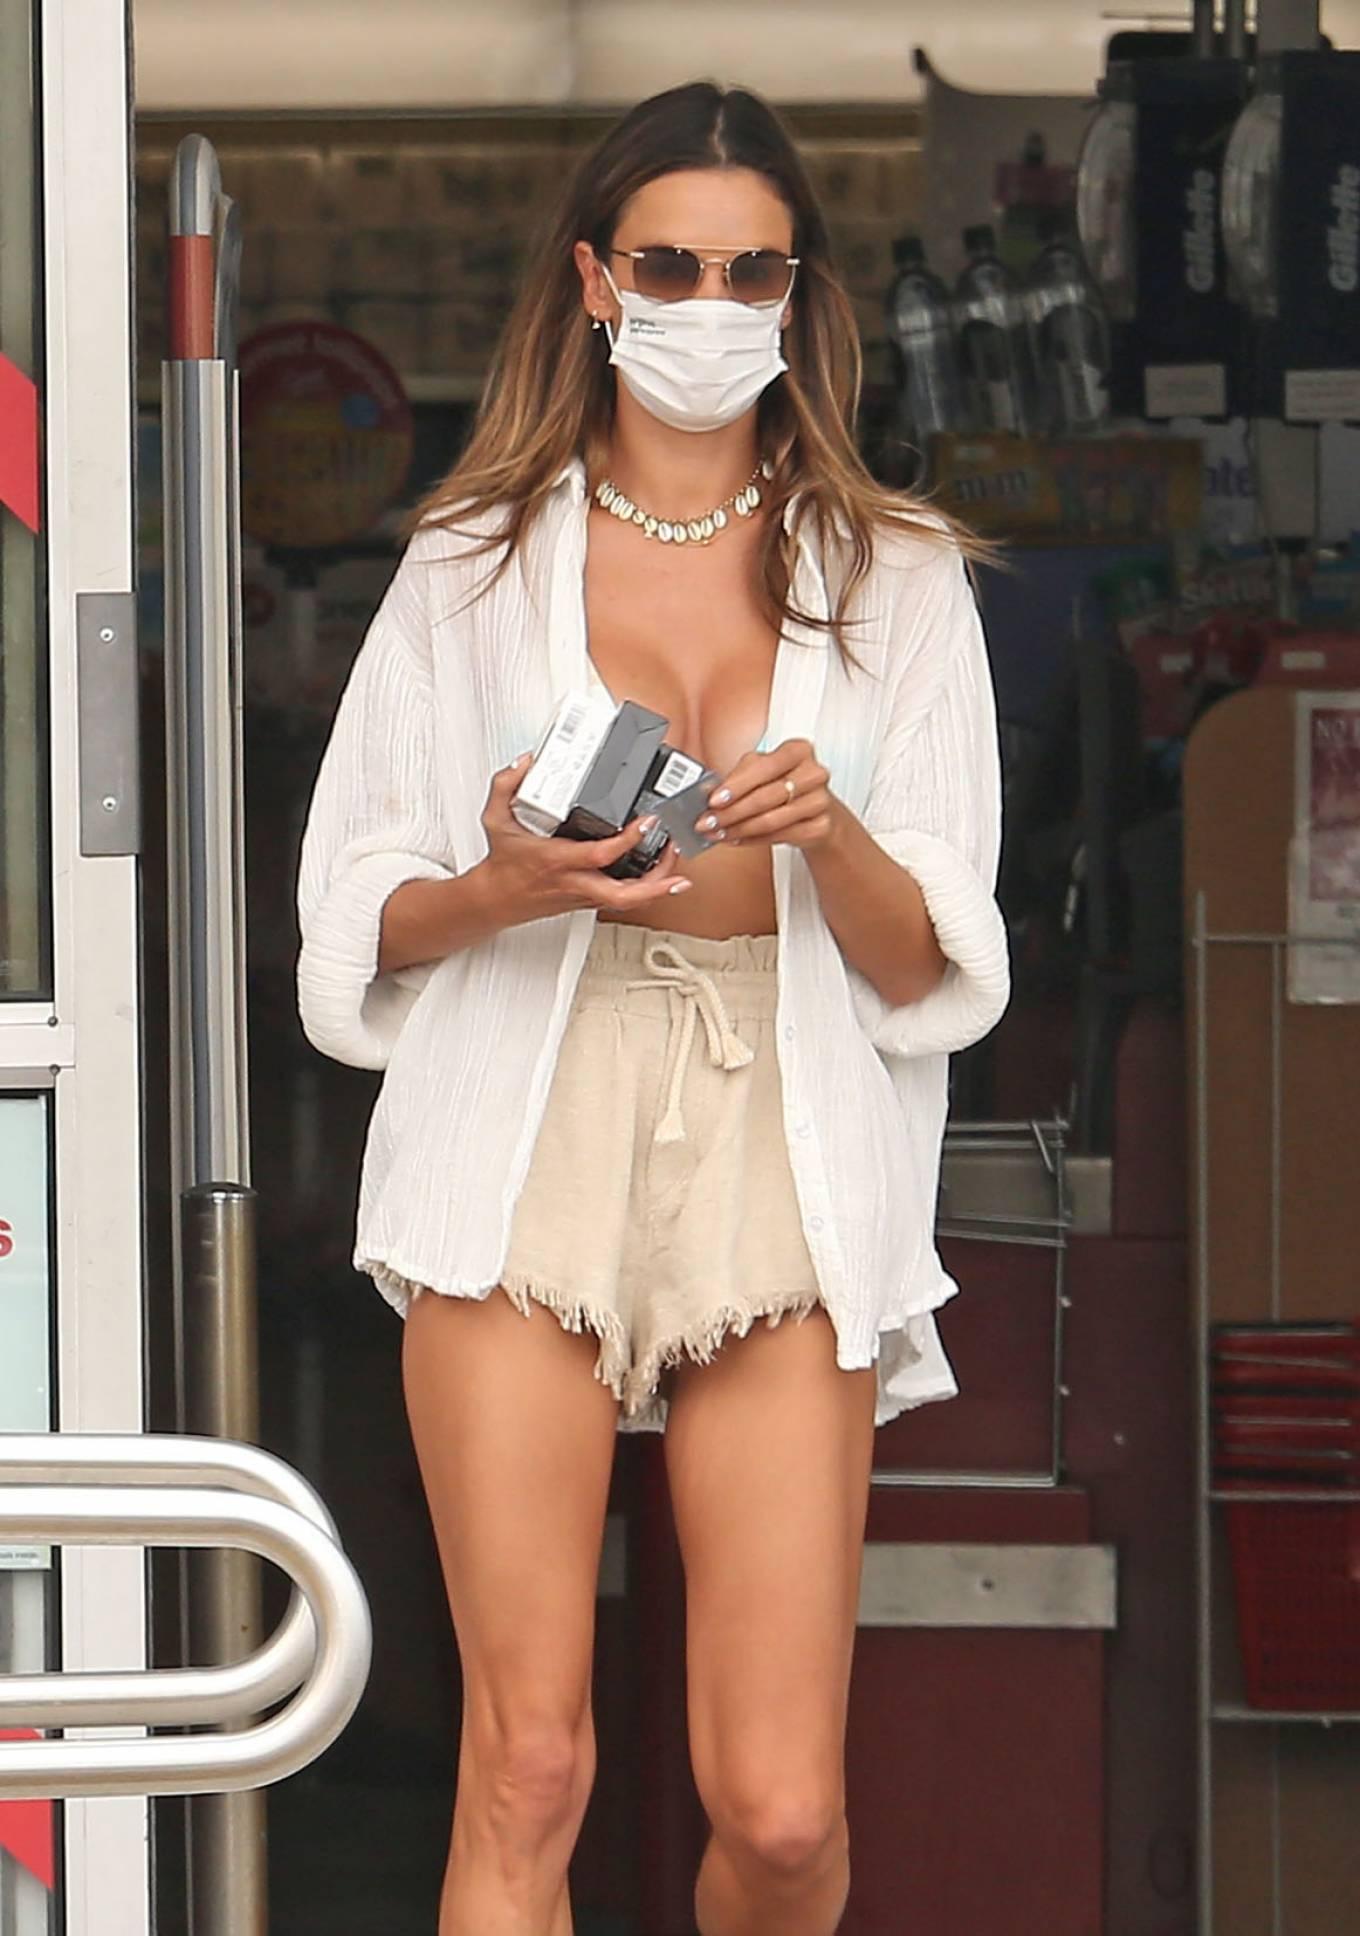 Alessandra Ambrosio 2020 : Alessandra Ambrosio – Wearing bikini top leaving CVS in Los Angeles-17